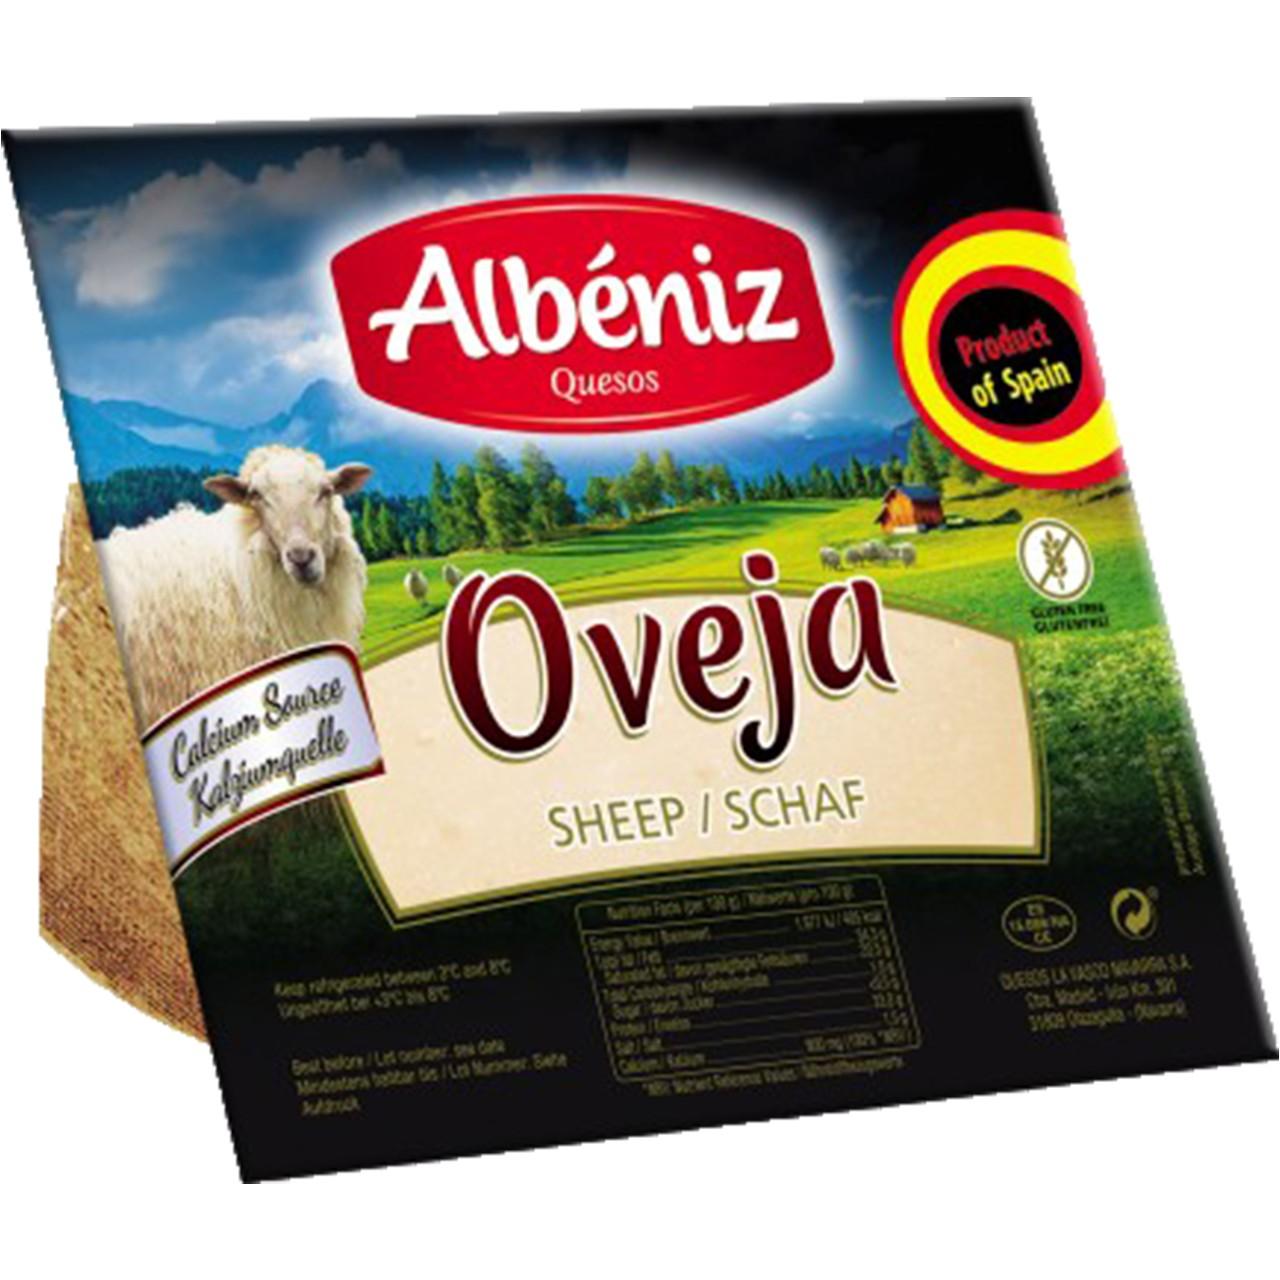 Schafskäse Albeniz 250 gr. - Queso de Oveja - Spanien